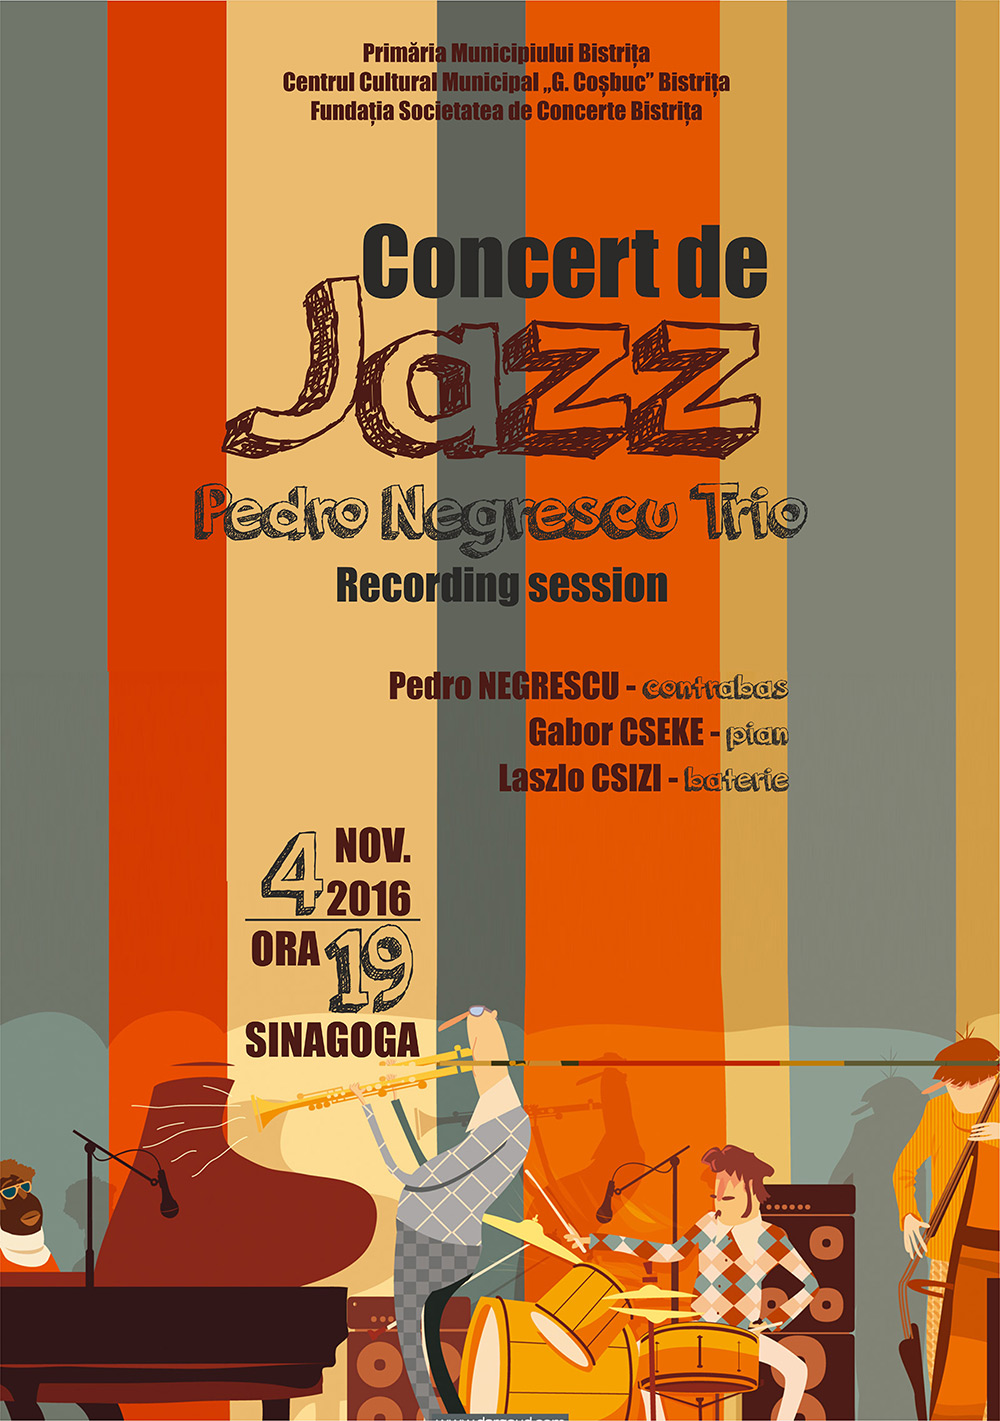 concert-de-jazz-pedro-negrescu-tri